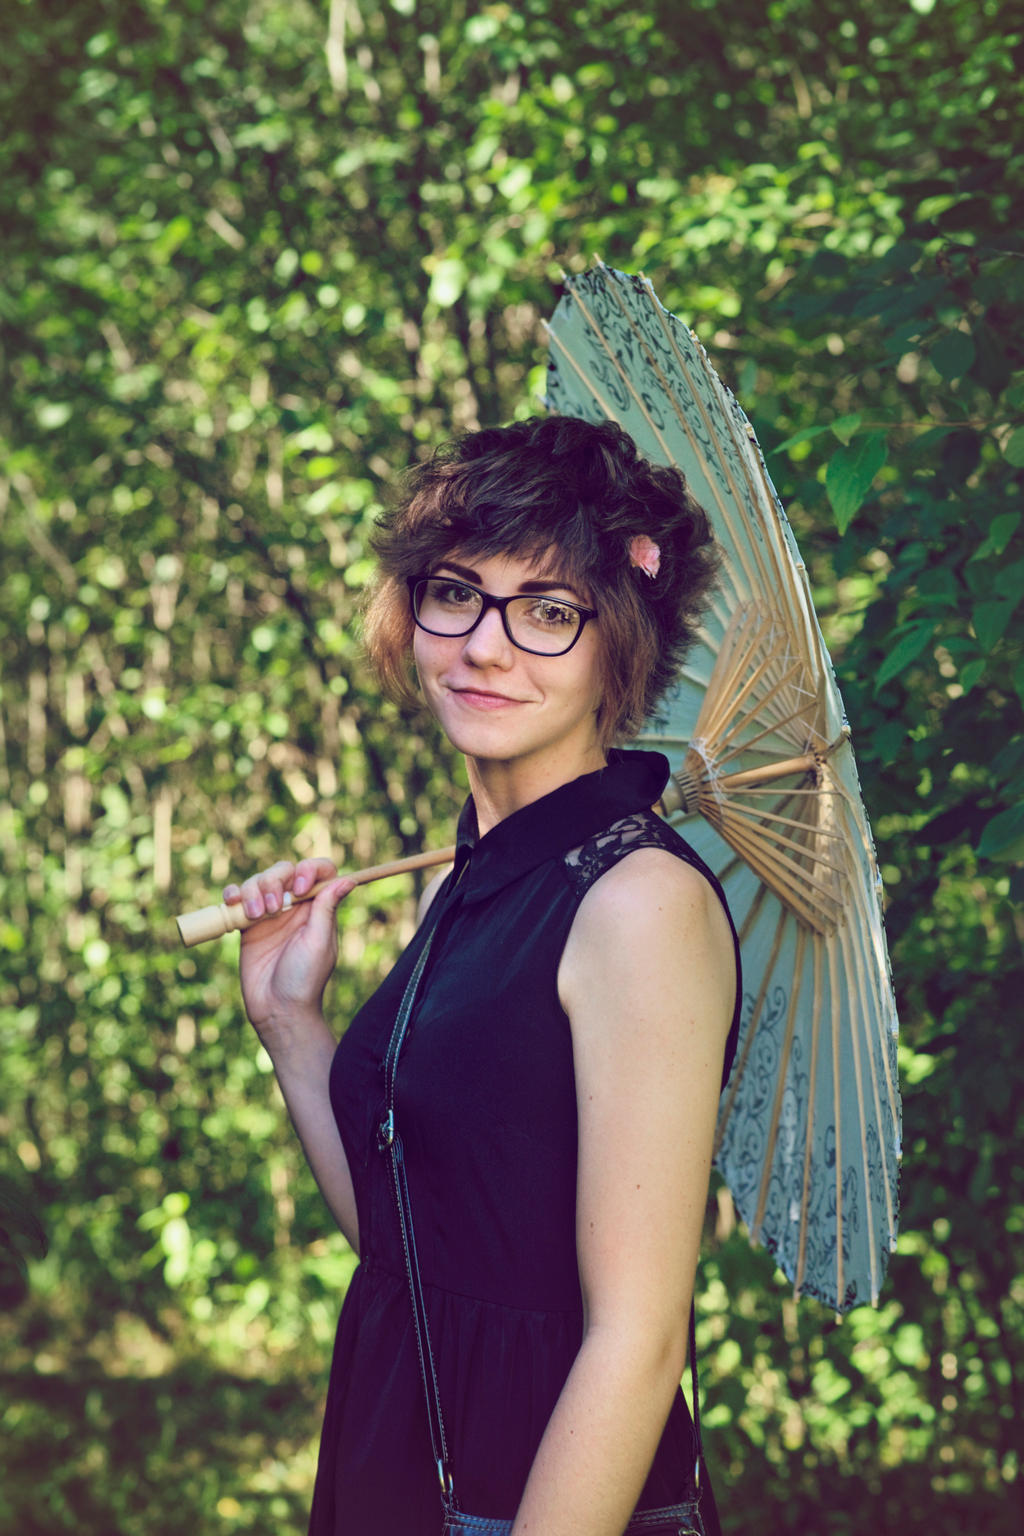 Jodi Umbrella by 5bodyblade